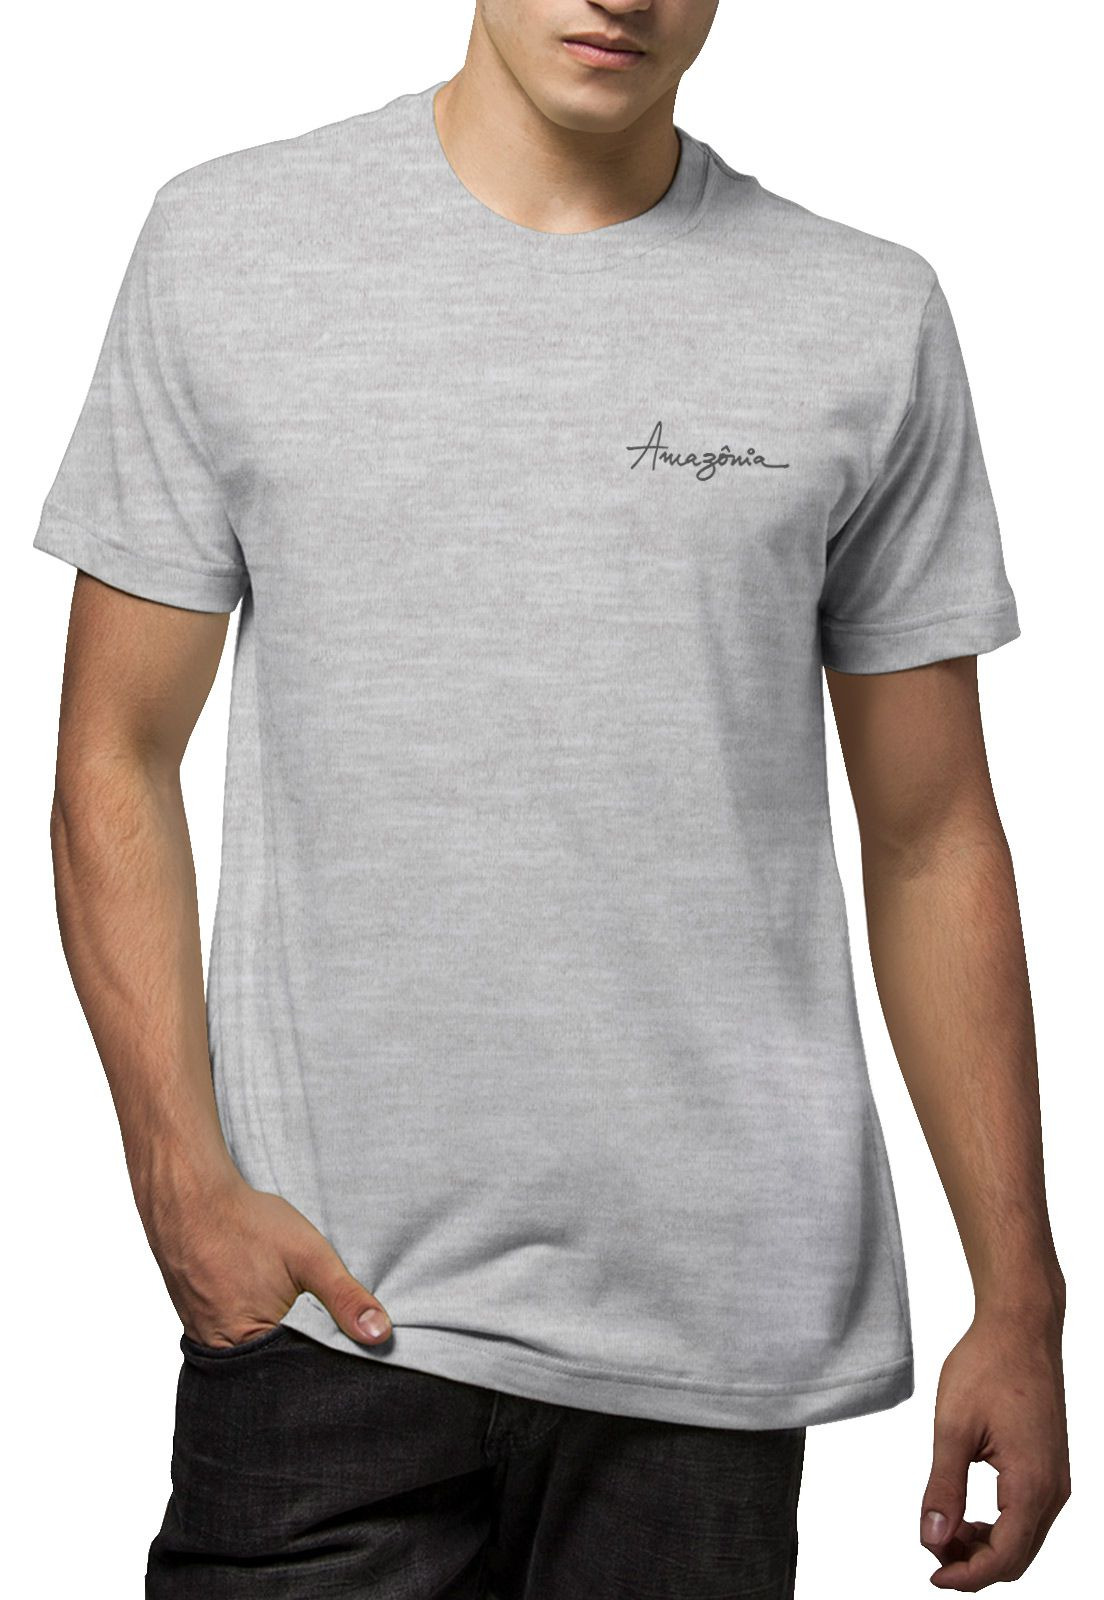 Camiseta Amazônia Bird Tree - Mescla